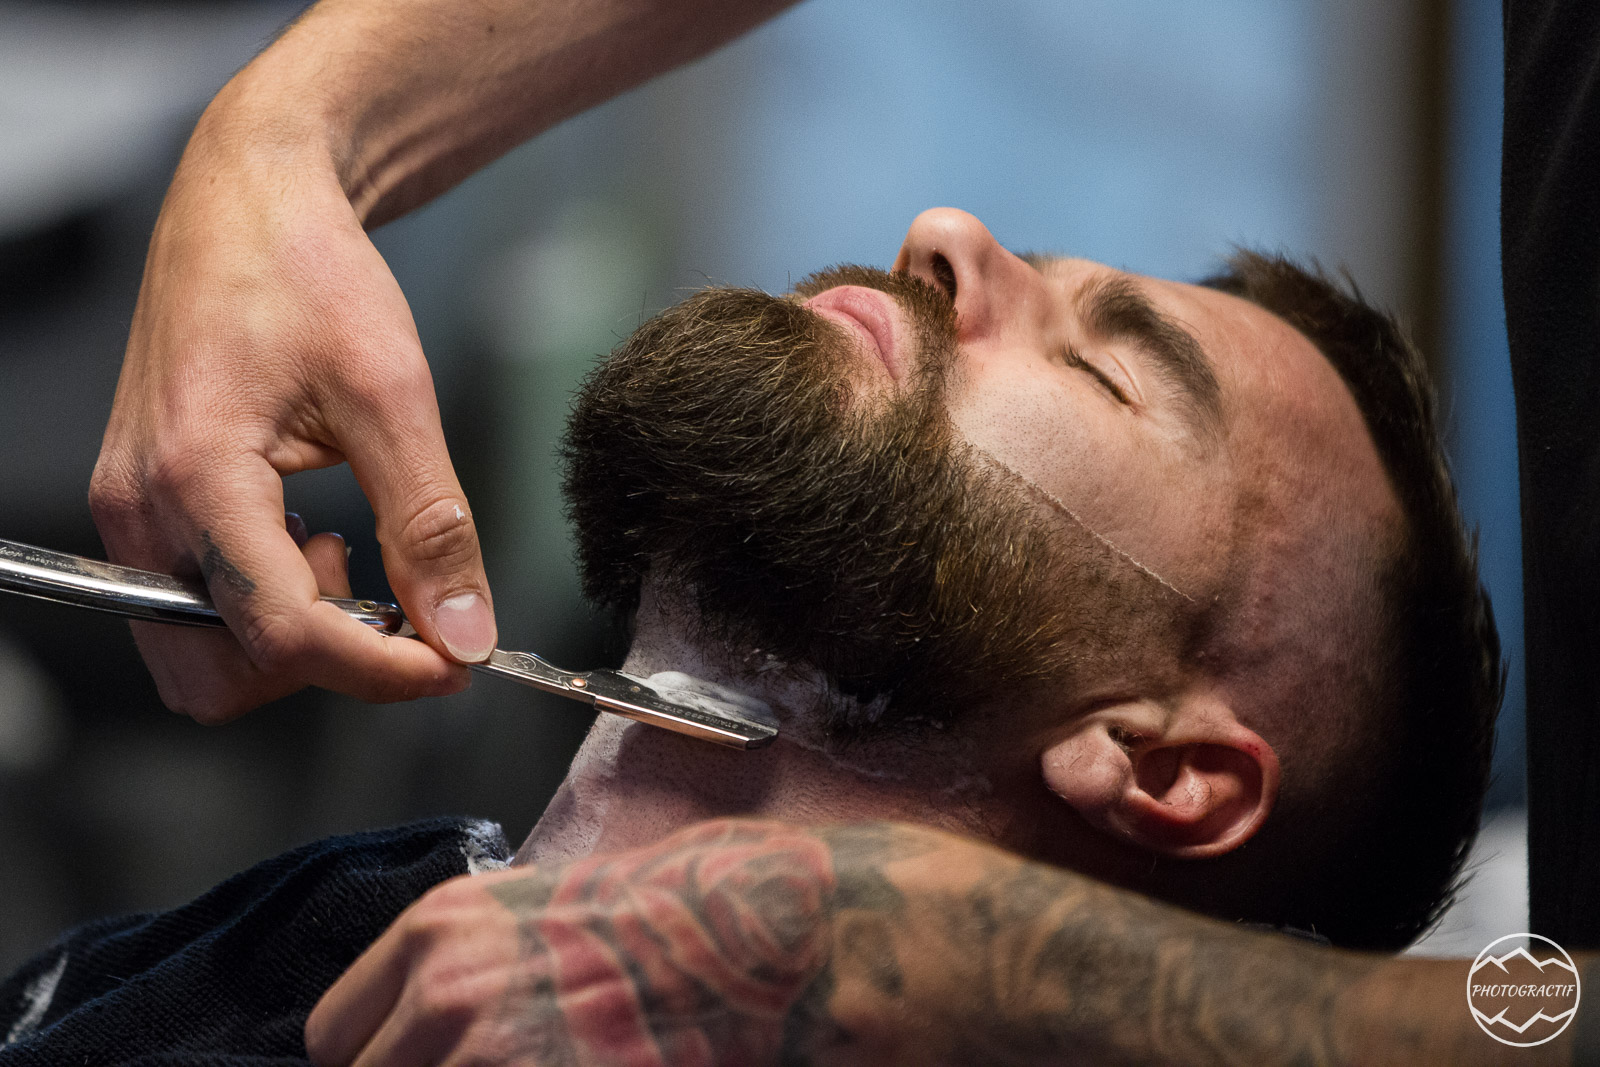 Arthur & John barber shop